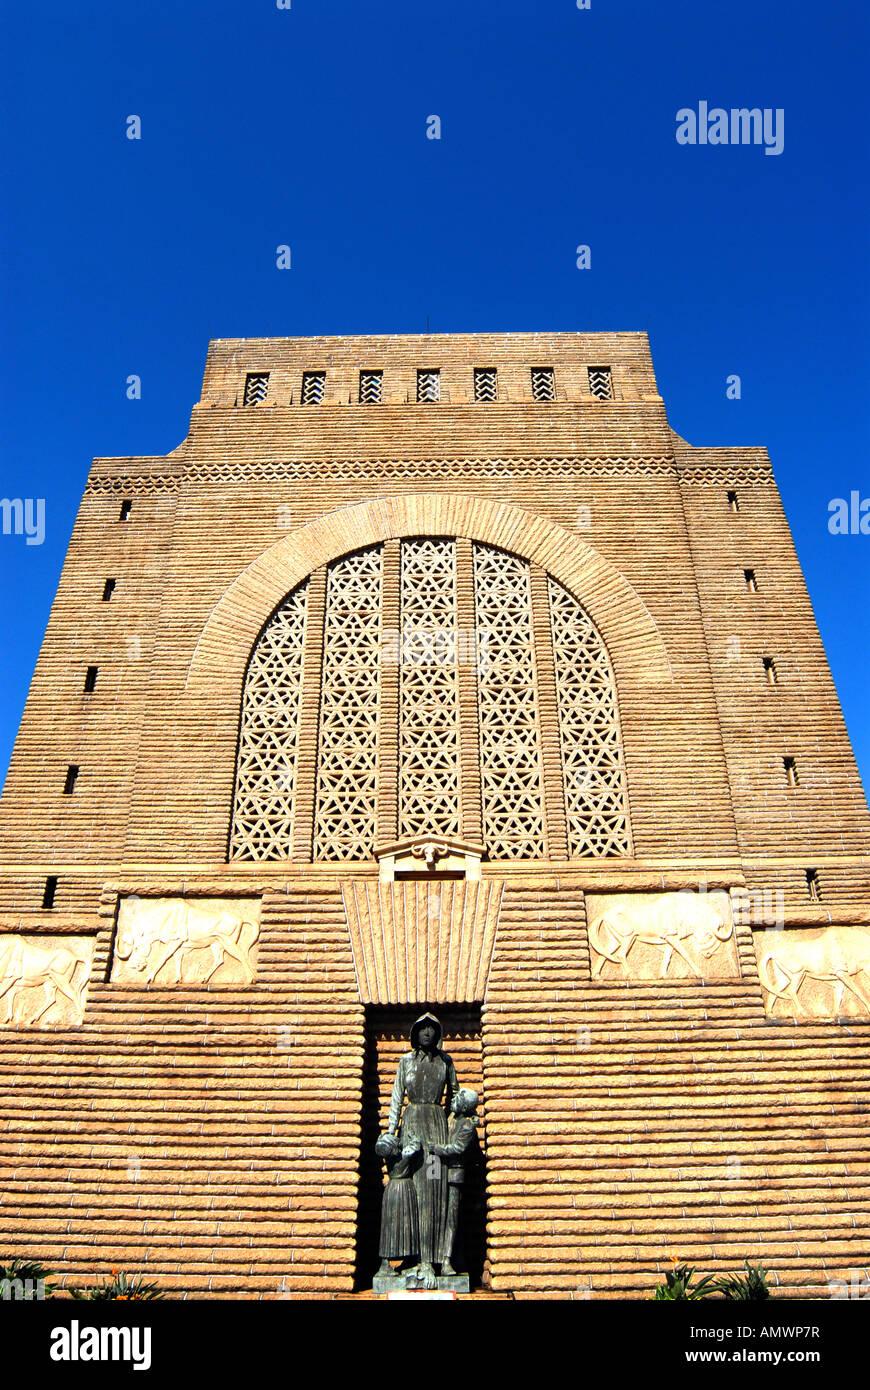 Voortrekker monument Pretoria South Africa - Stock Image